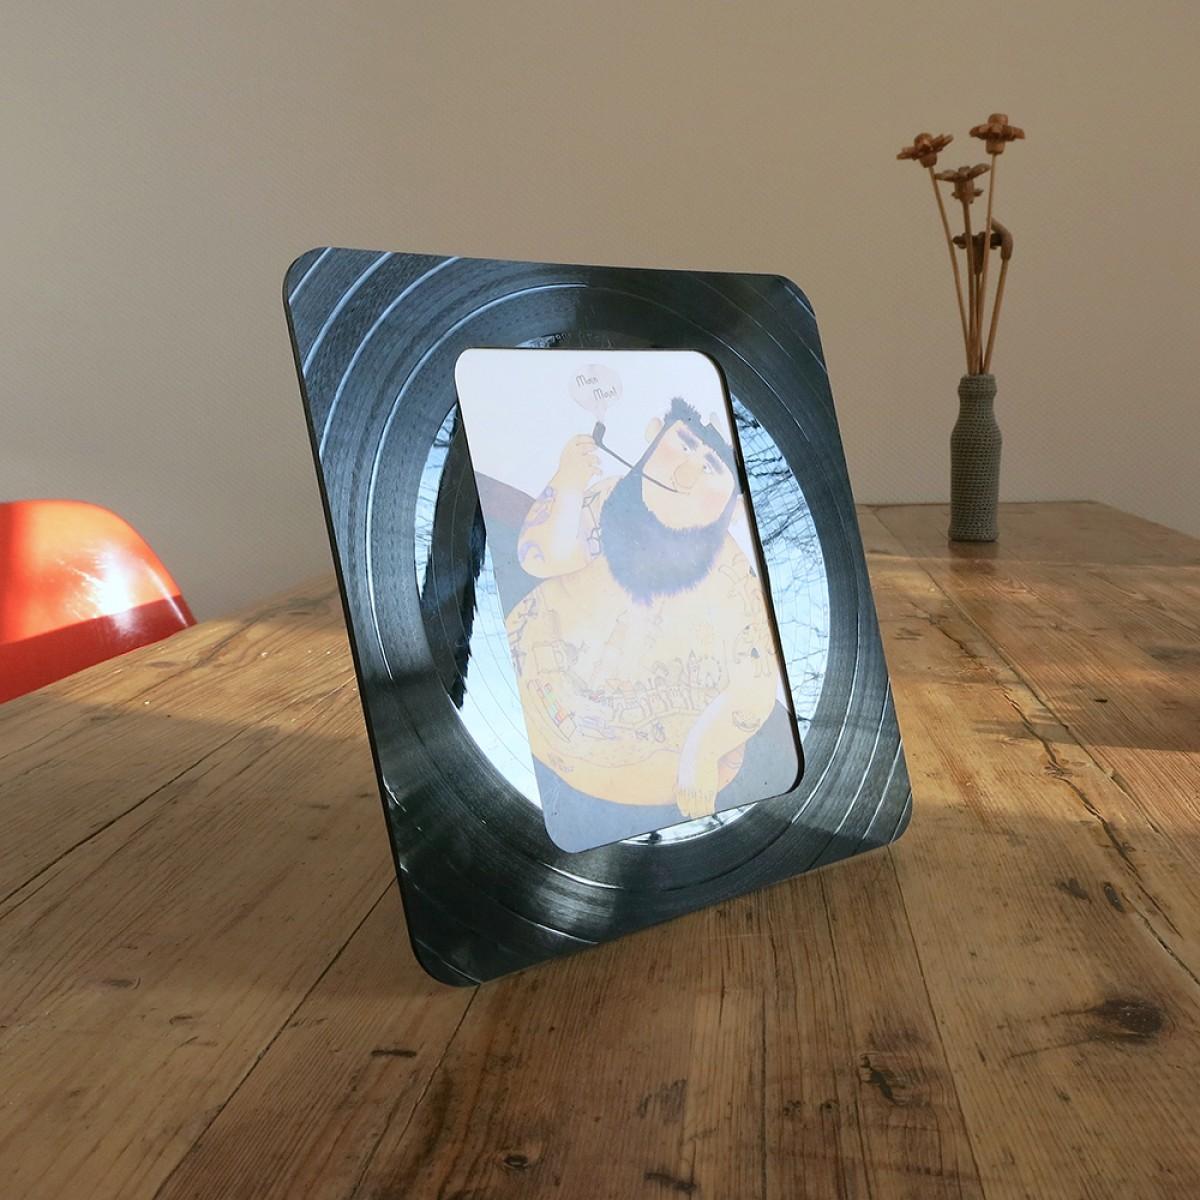 Lockengelöt Picture Disc - Magnetischer Bilderrahmen aus Schallplatten